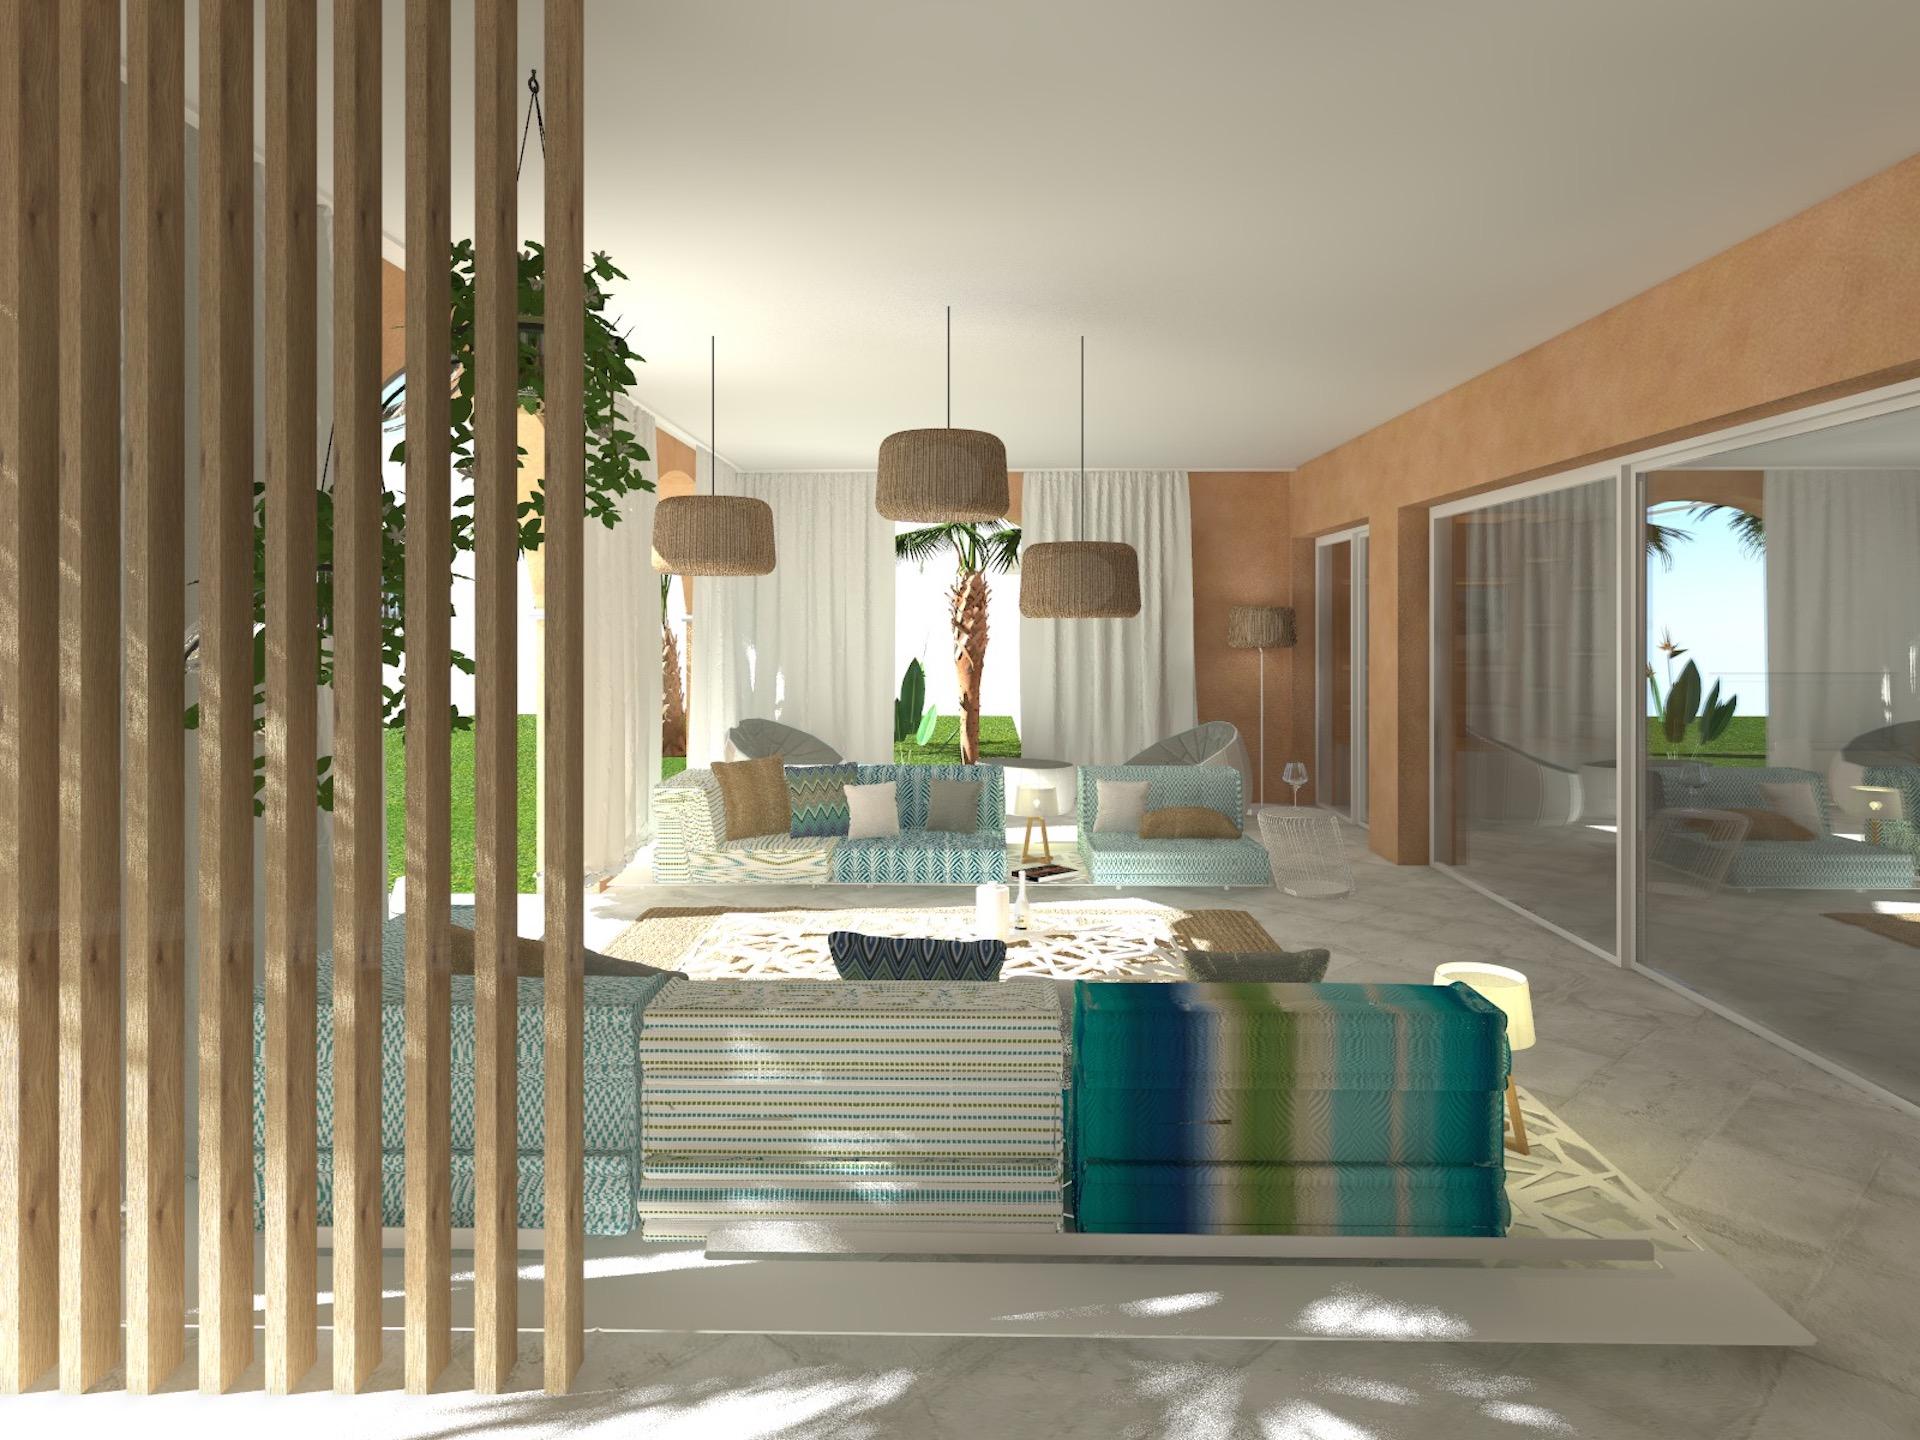 renovation villa luxe semaphore sainte-maxime var architecture interieure28